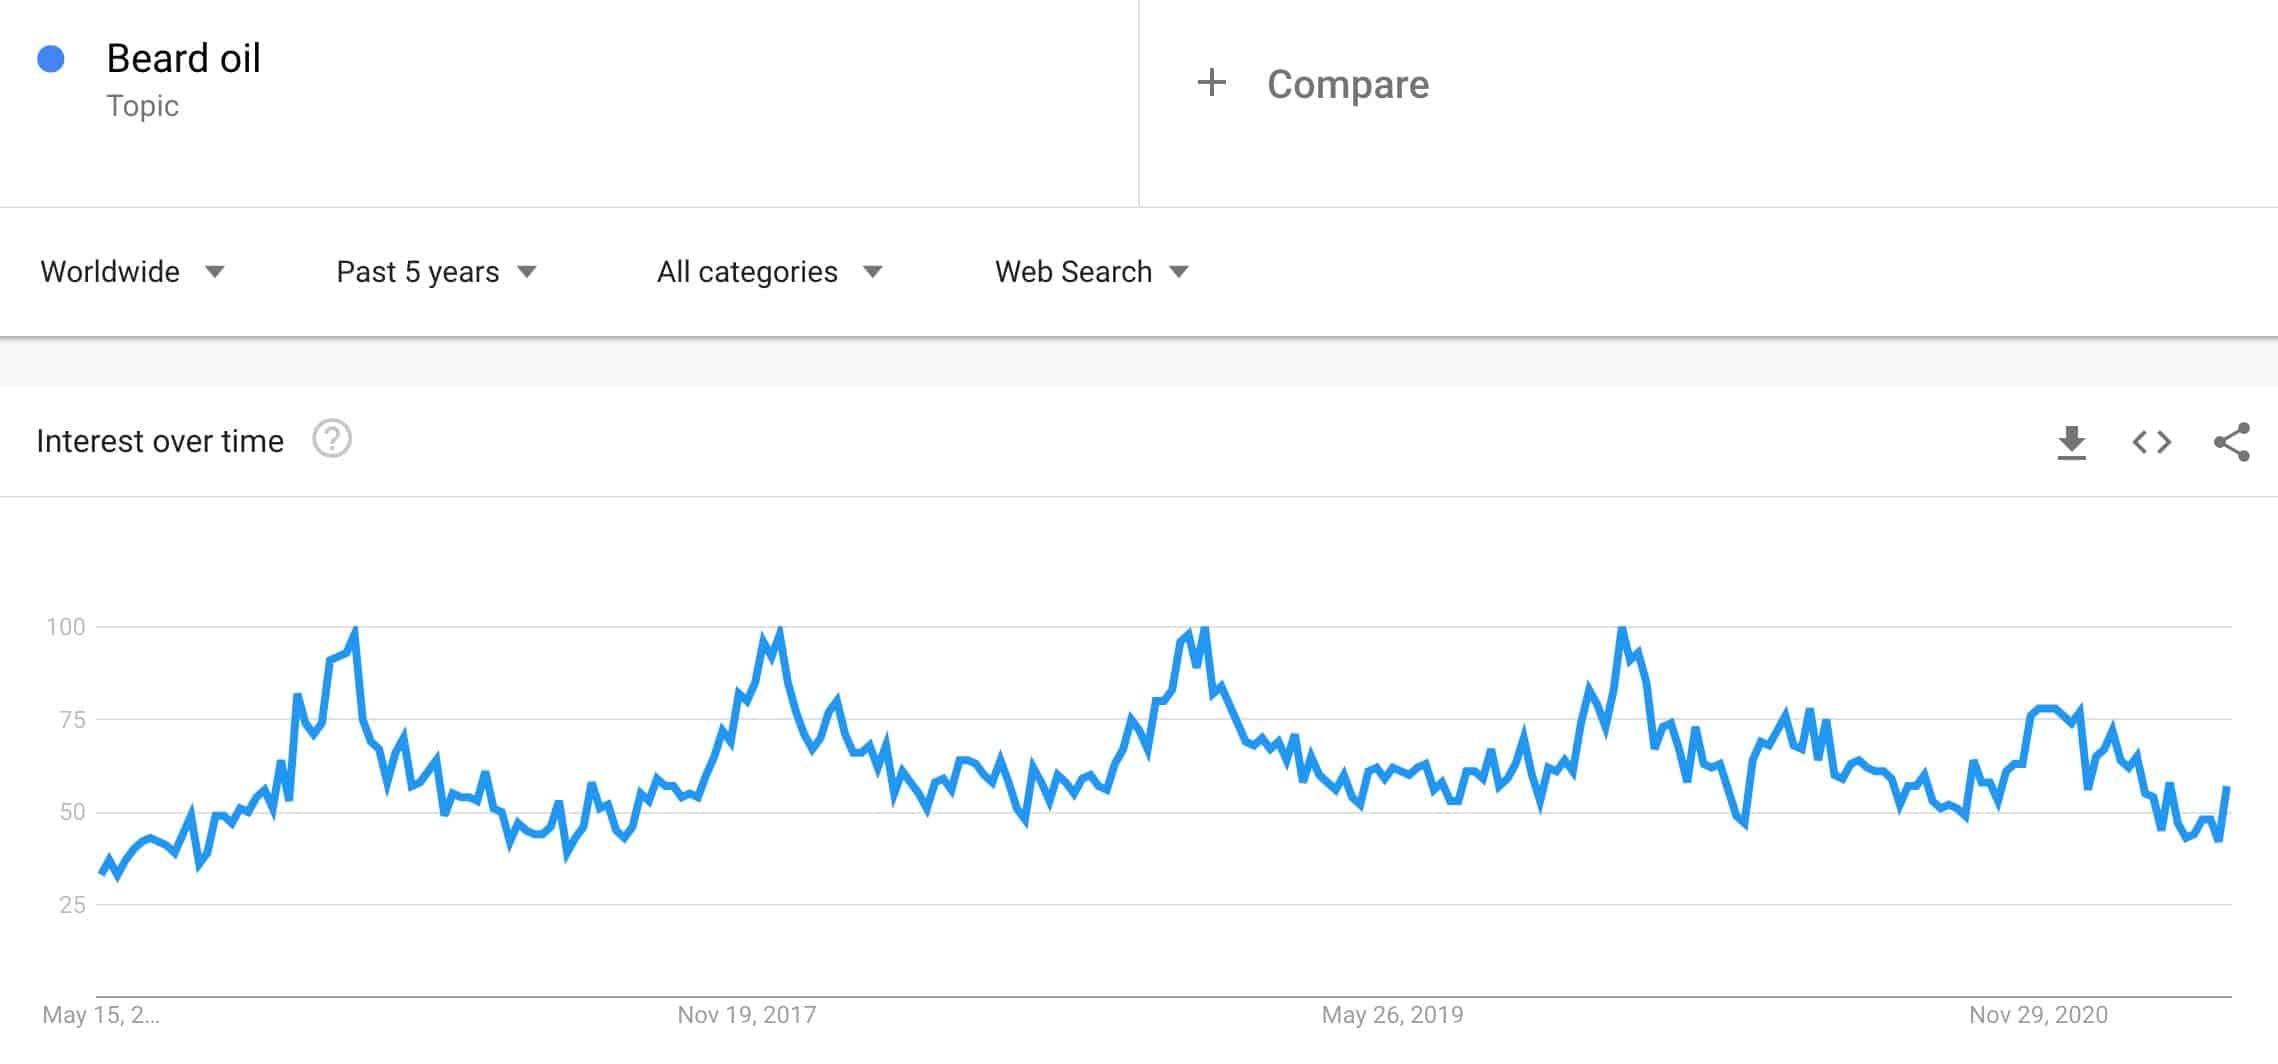 beard oil trend